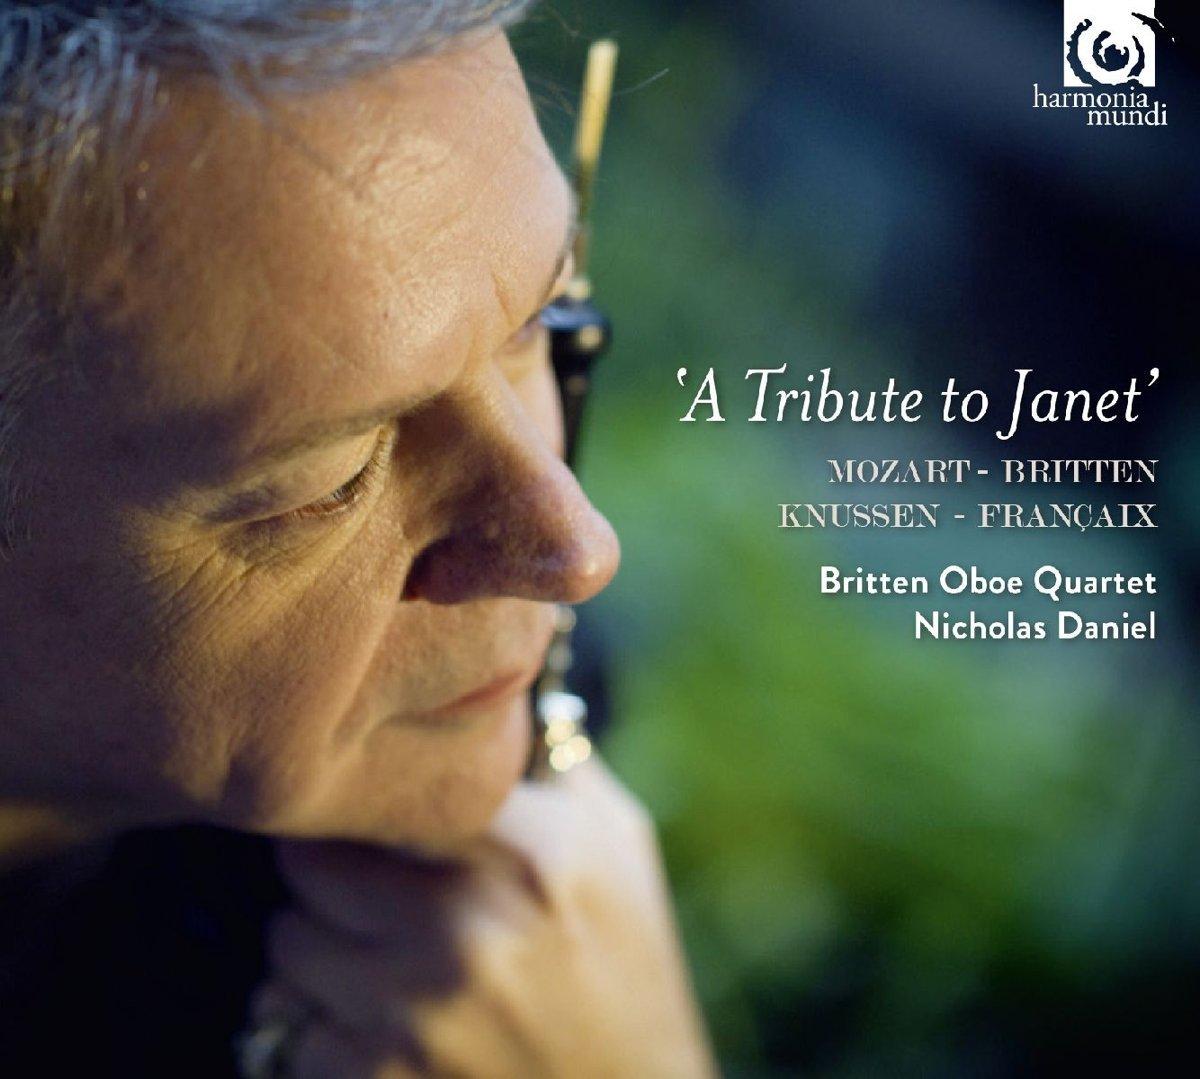 A Tribute To Janet Nicholas Daniel (Artist), Britt